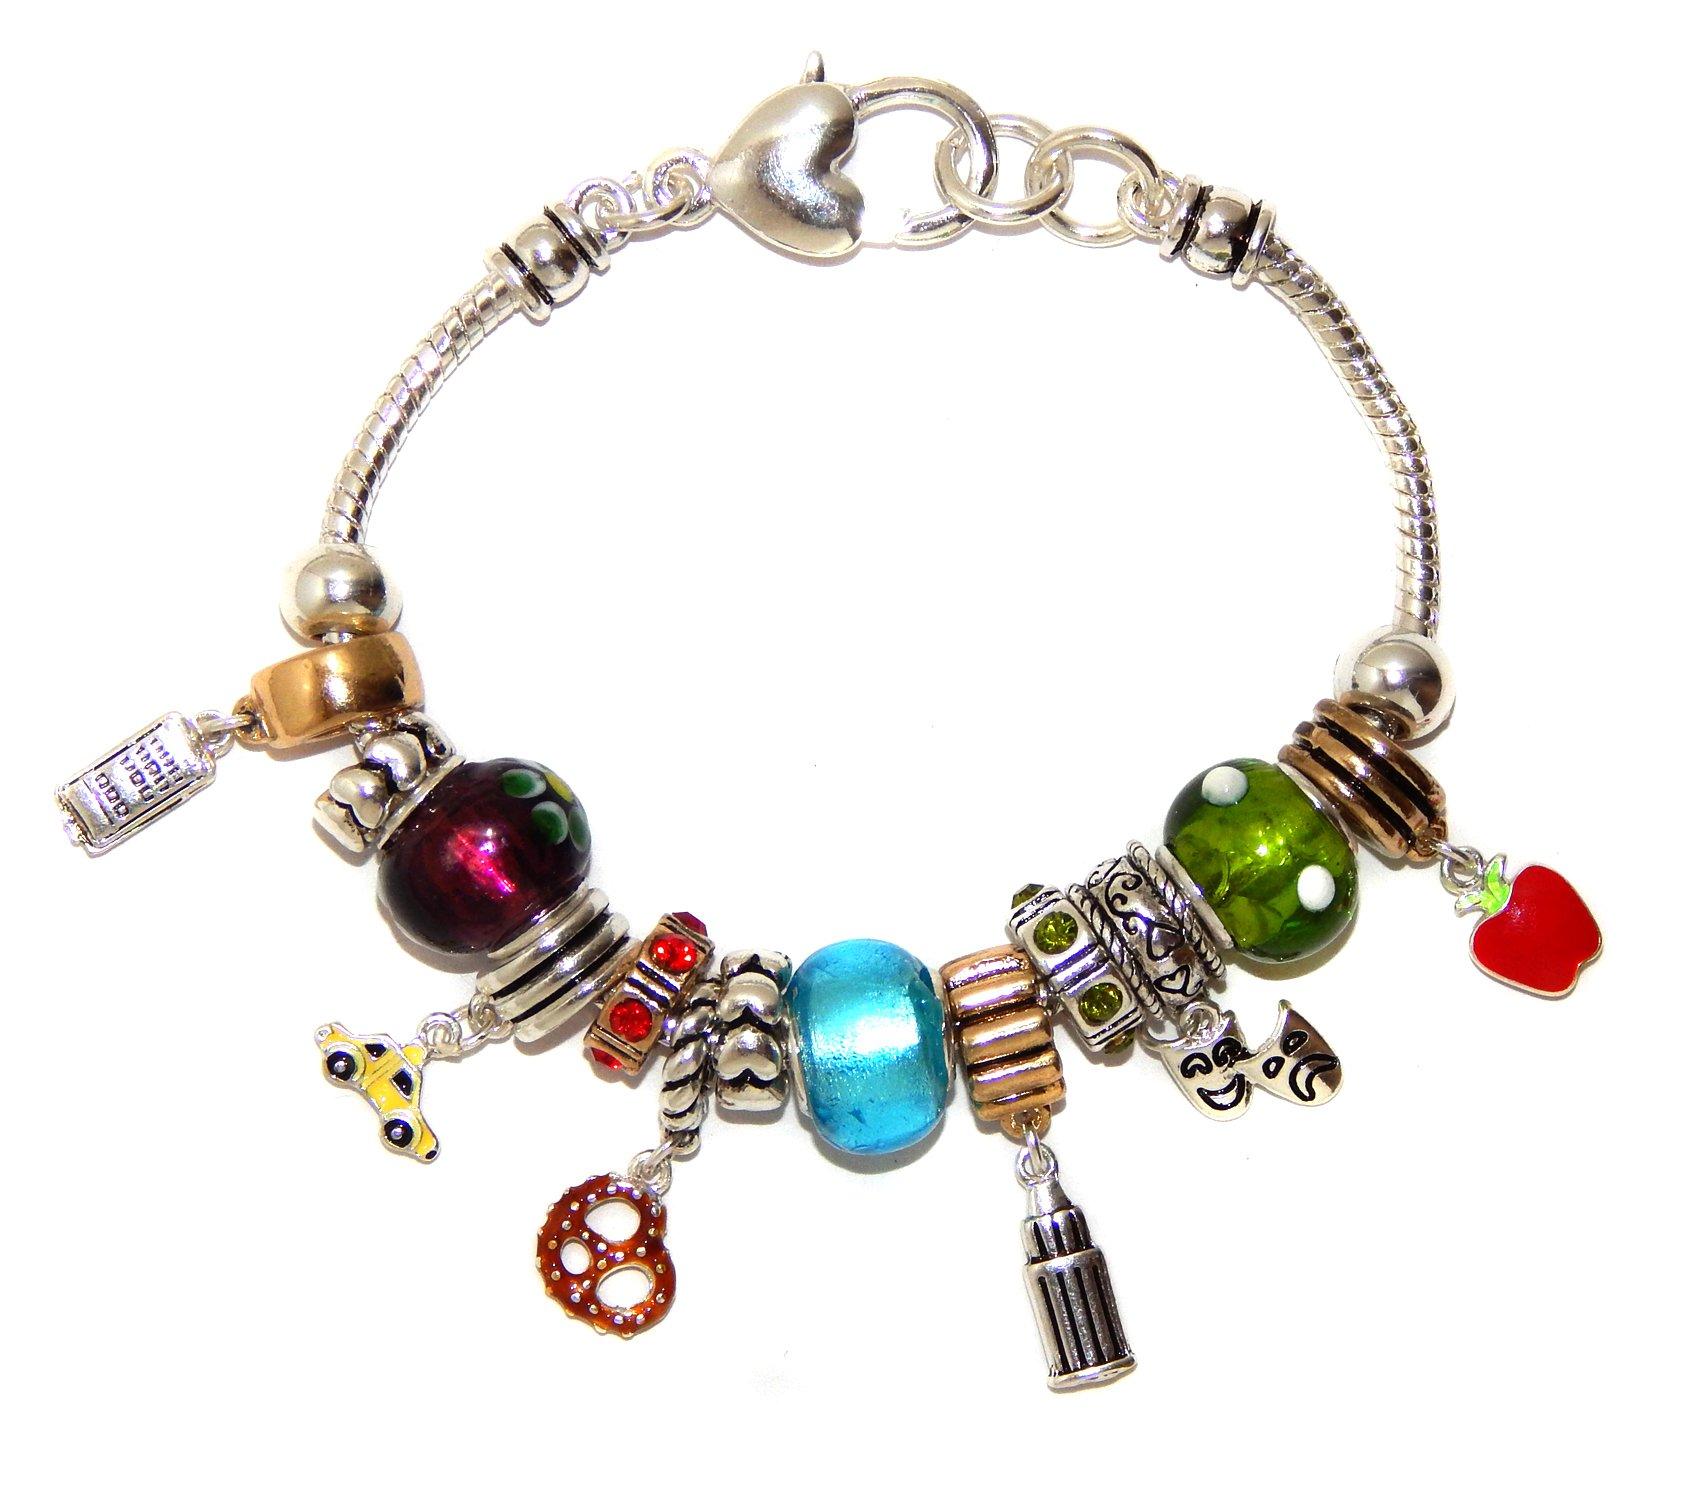 Landau Ambrosia New York Theme Charm Bracelet